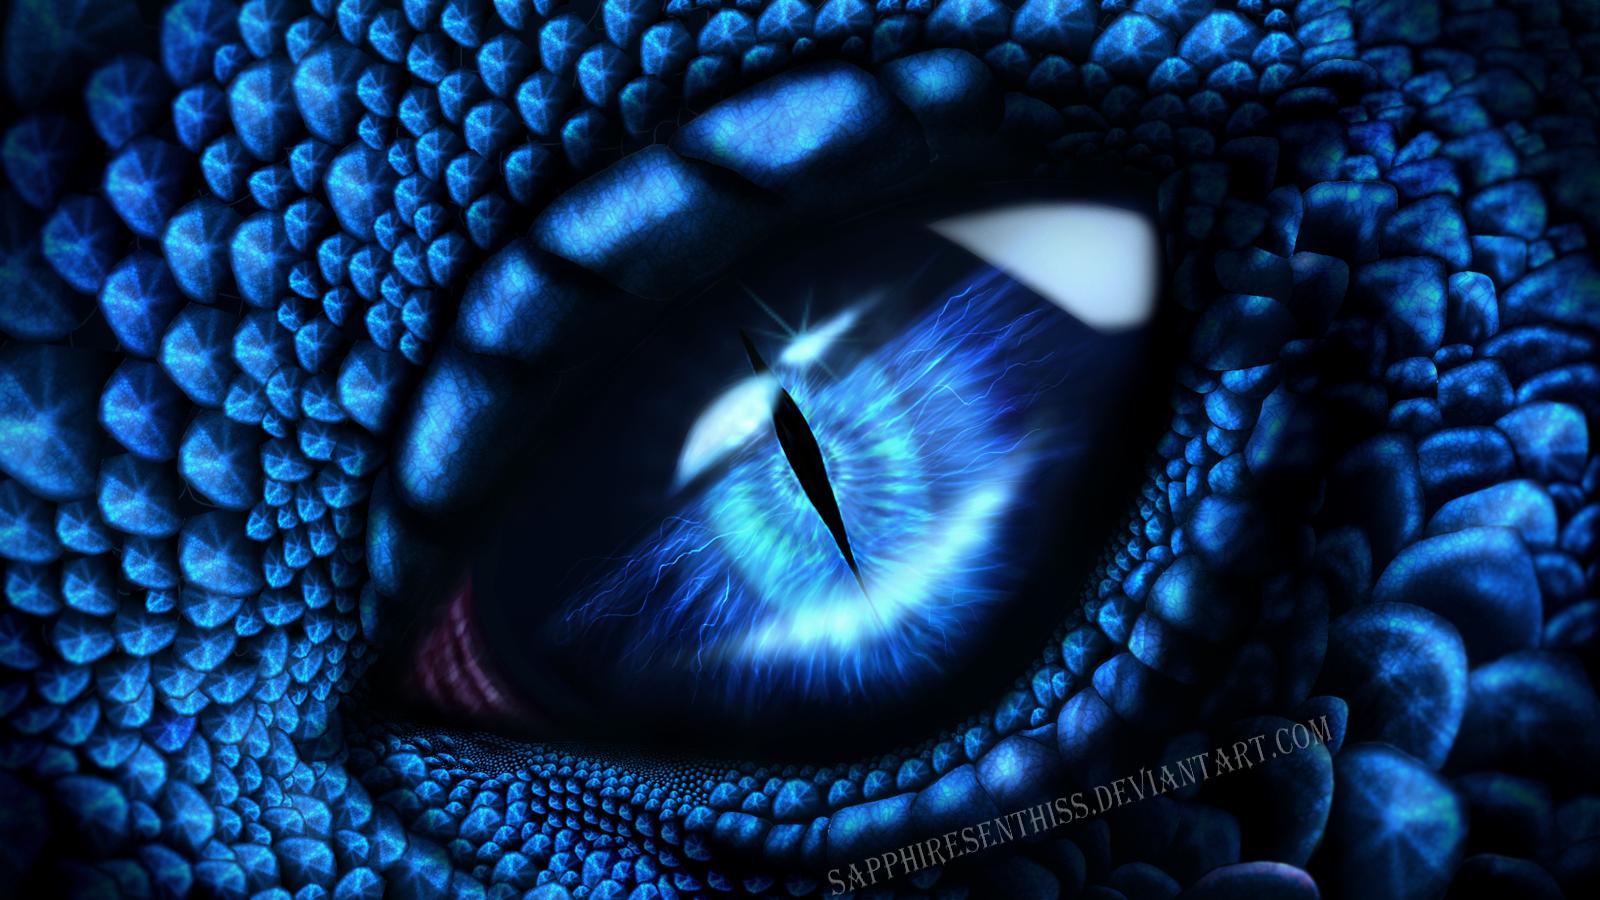 Sapphiresenthiss Eye 2 By Sapphiresenthiss Dagguqy Png 1 600 900 Pixels Dragon Eye Dragon Eye Drawing Dragon Artwork